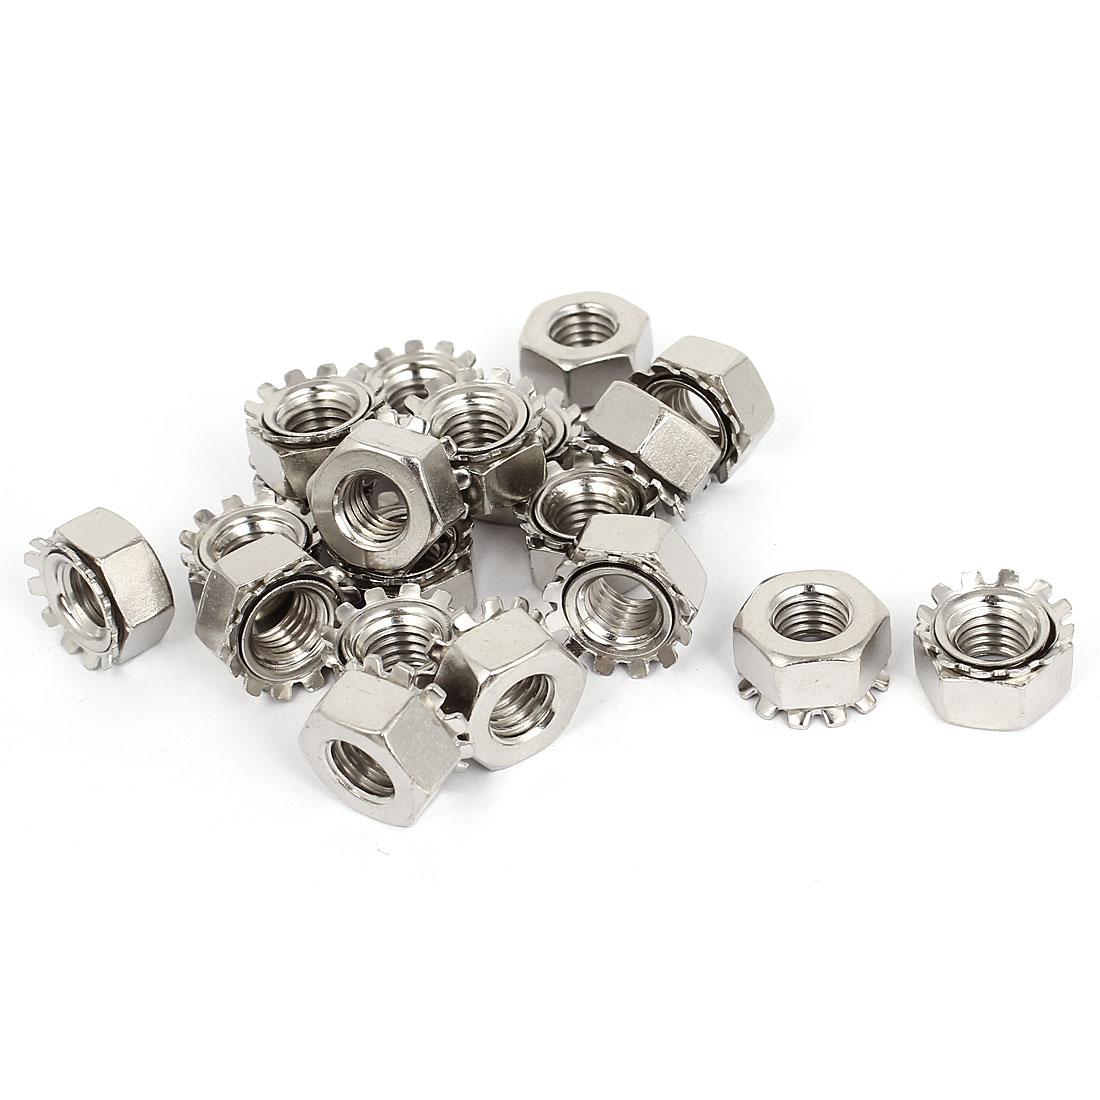 10mm Thread Dia Nickel Plated External Tooth K Lock Kep Nut Silver Tone 20Pcs